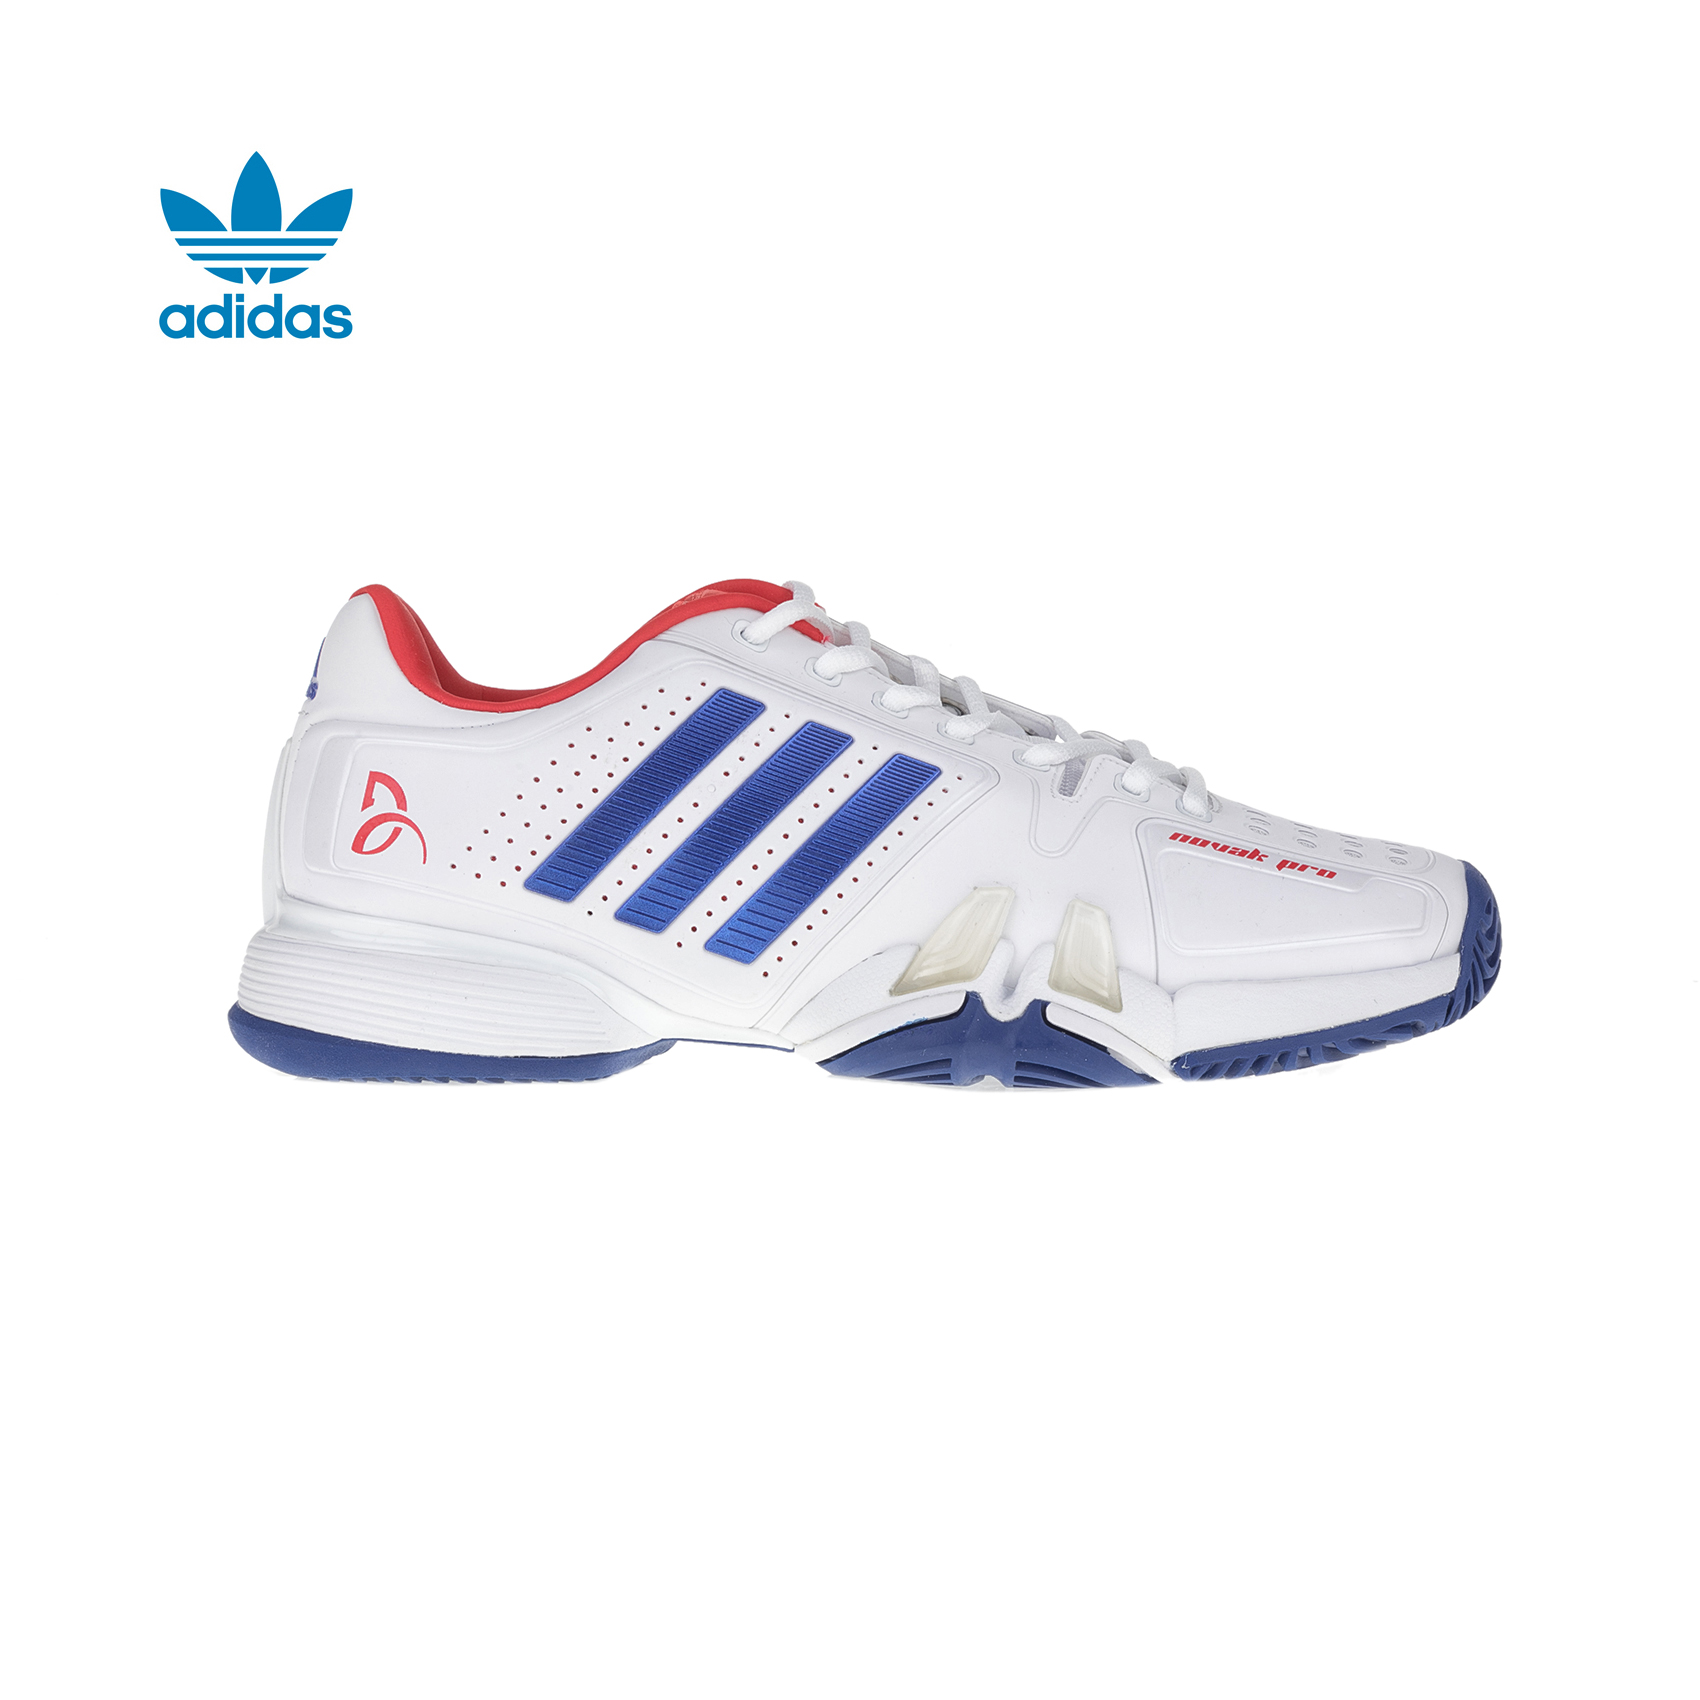 adidas Originals – Ανδρικά παούτσια τένις adidas novak pro λευκά